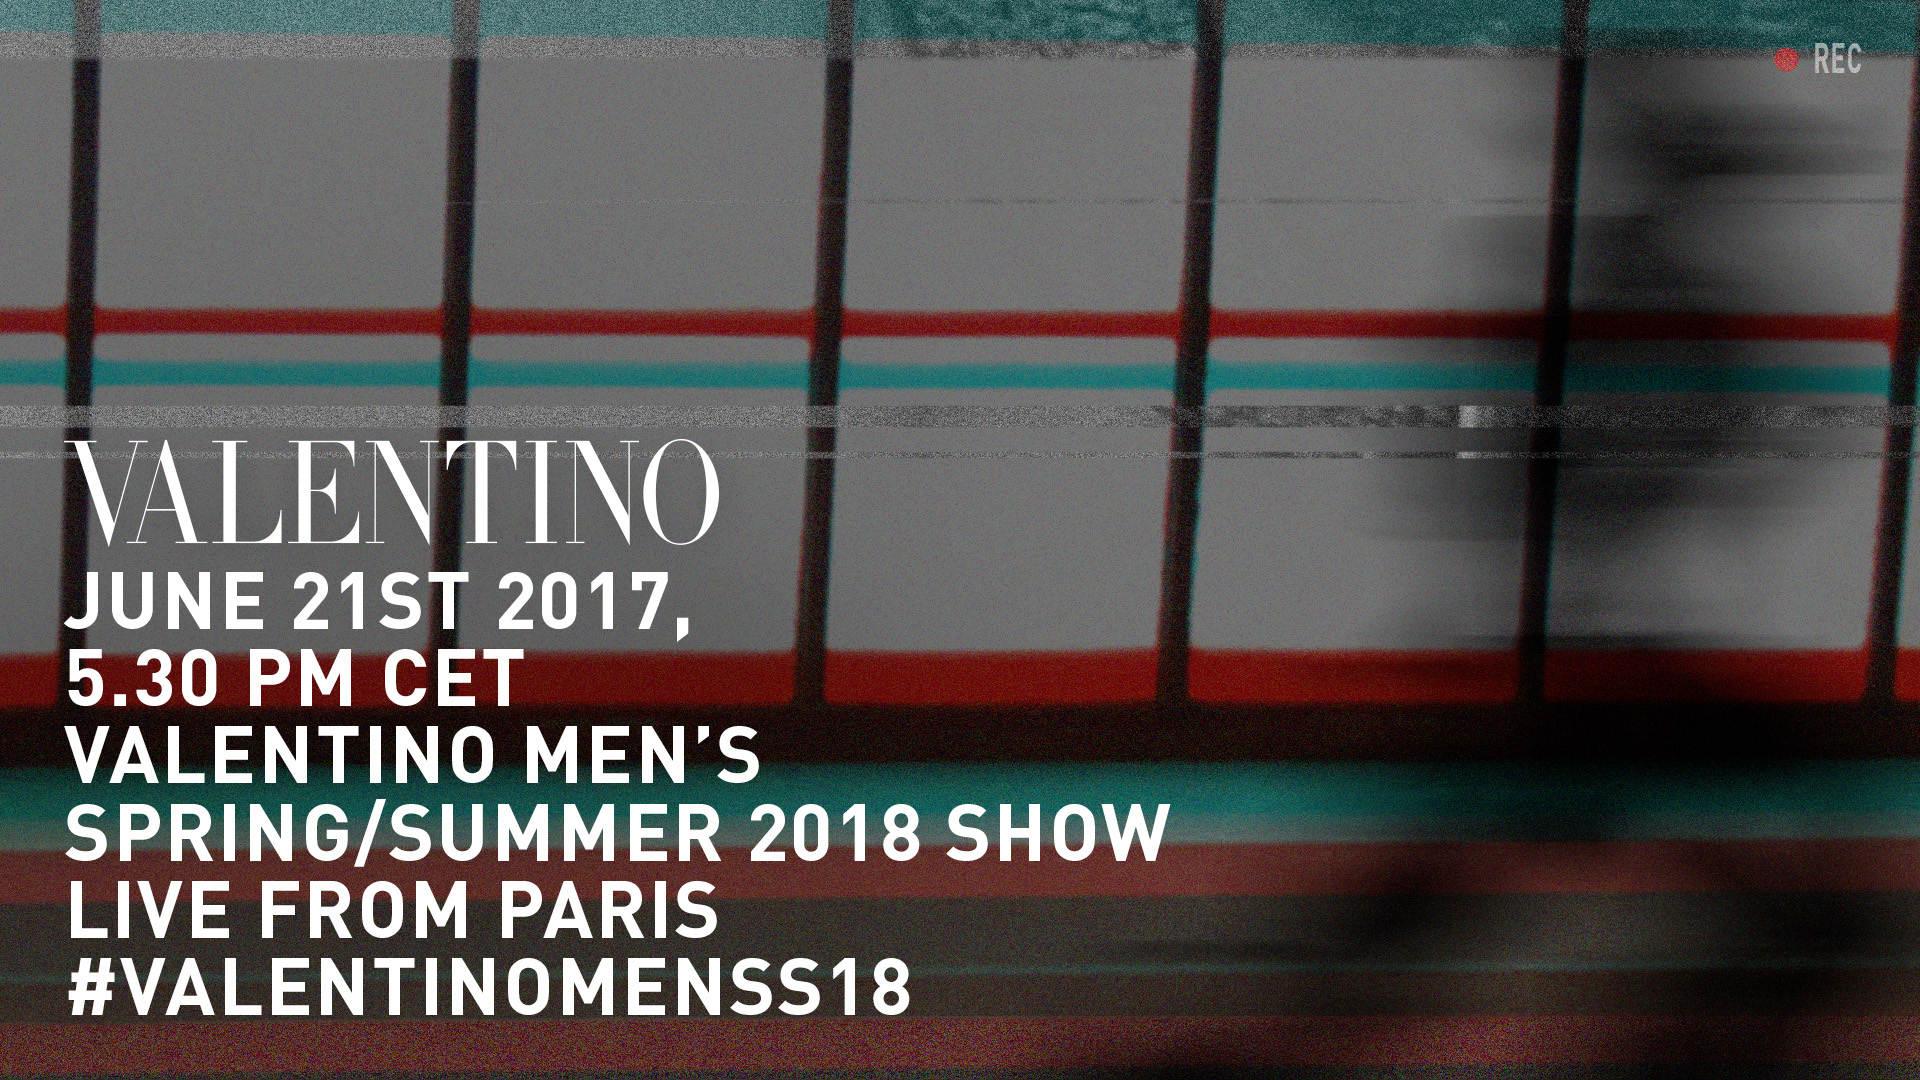 Valentino Men's Spring Summer 2018 Fashion Show Live Streaming Paris